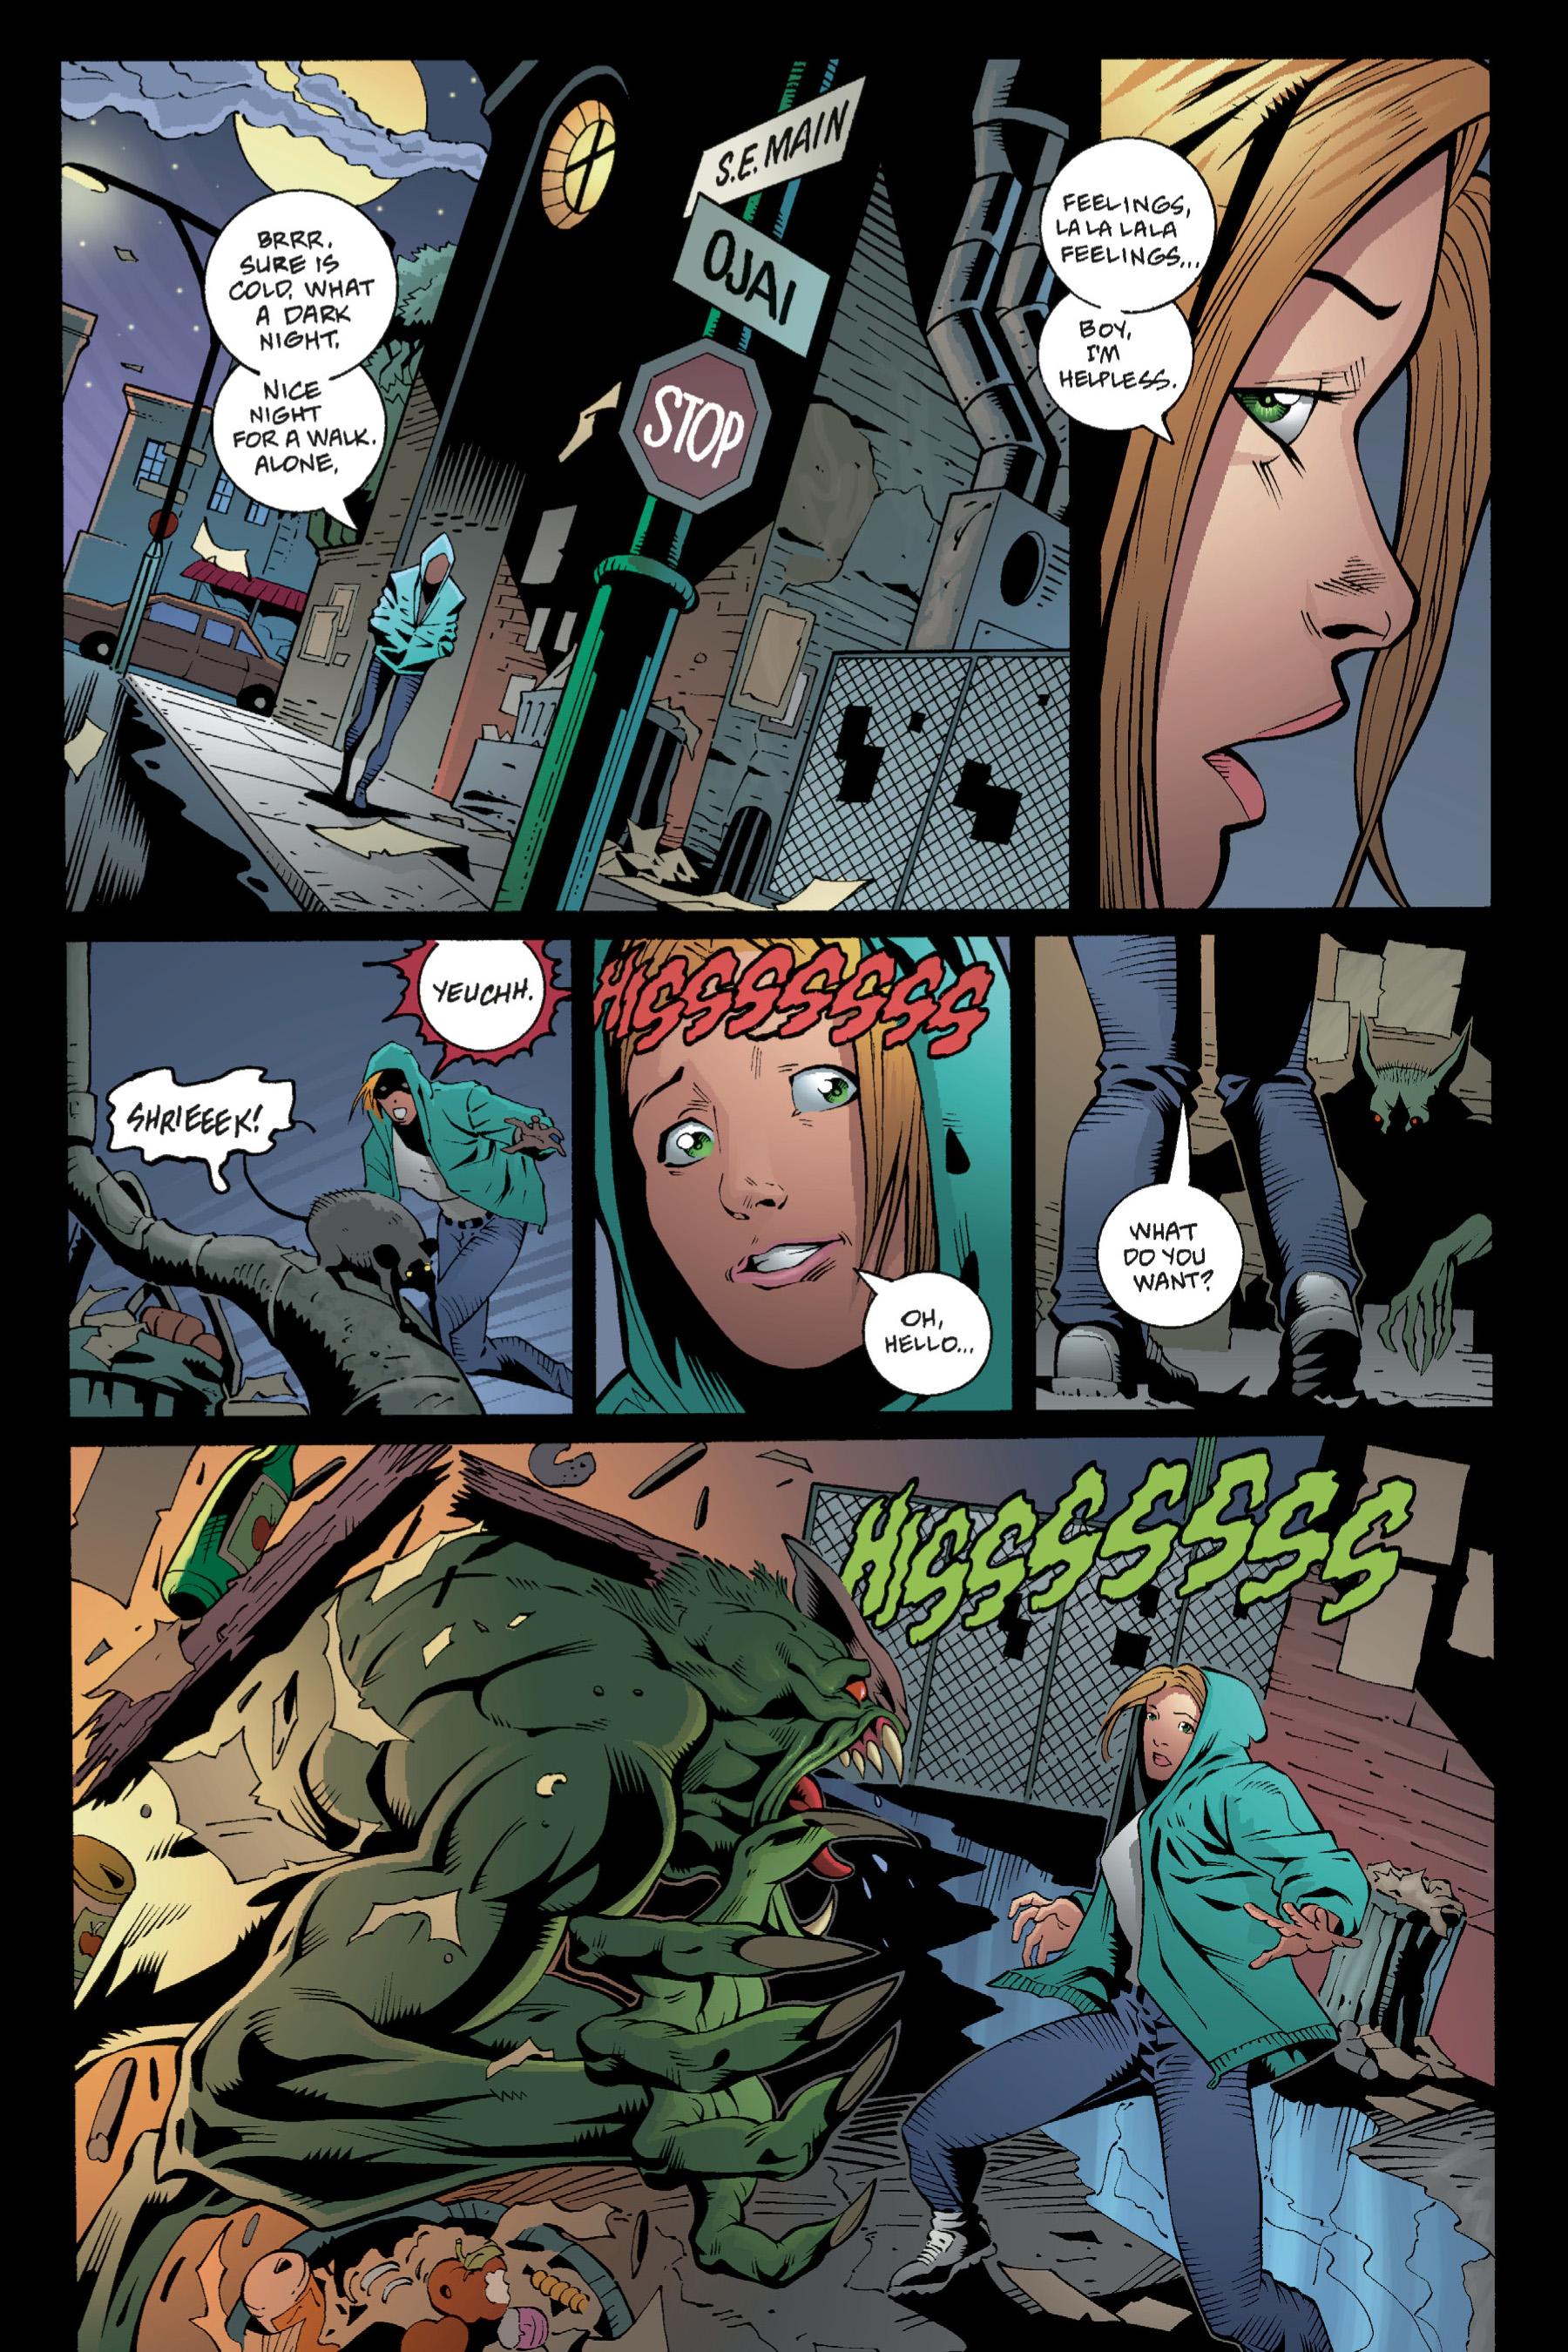 Read online Buffy the Vampire Slayer: Omnibus comic -  Issue # TPB 1 - 68